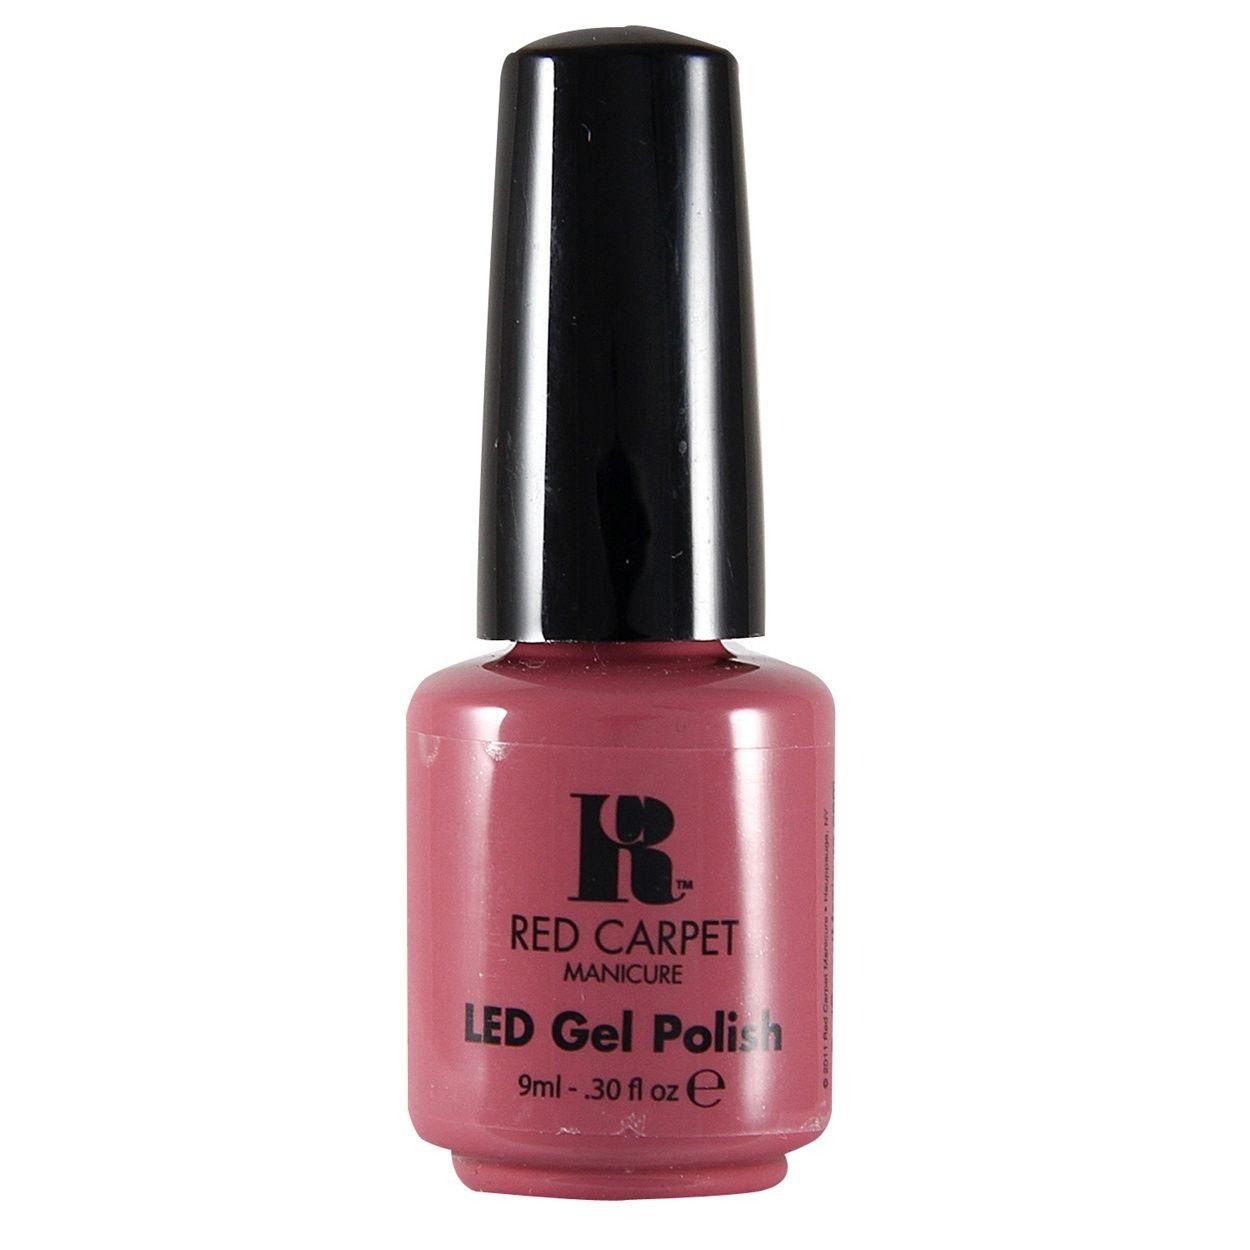 Red Carpet Manicure \'Envelope please\' LED gel nail polish 9ml- at ...